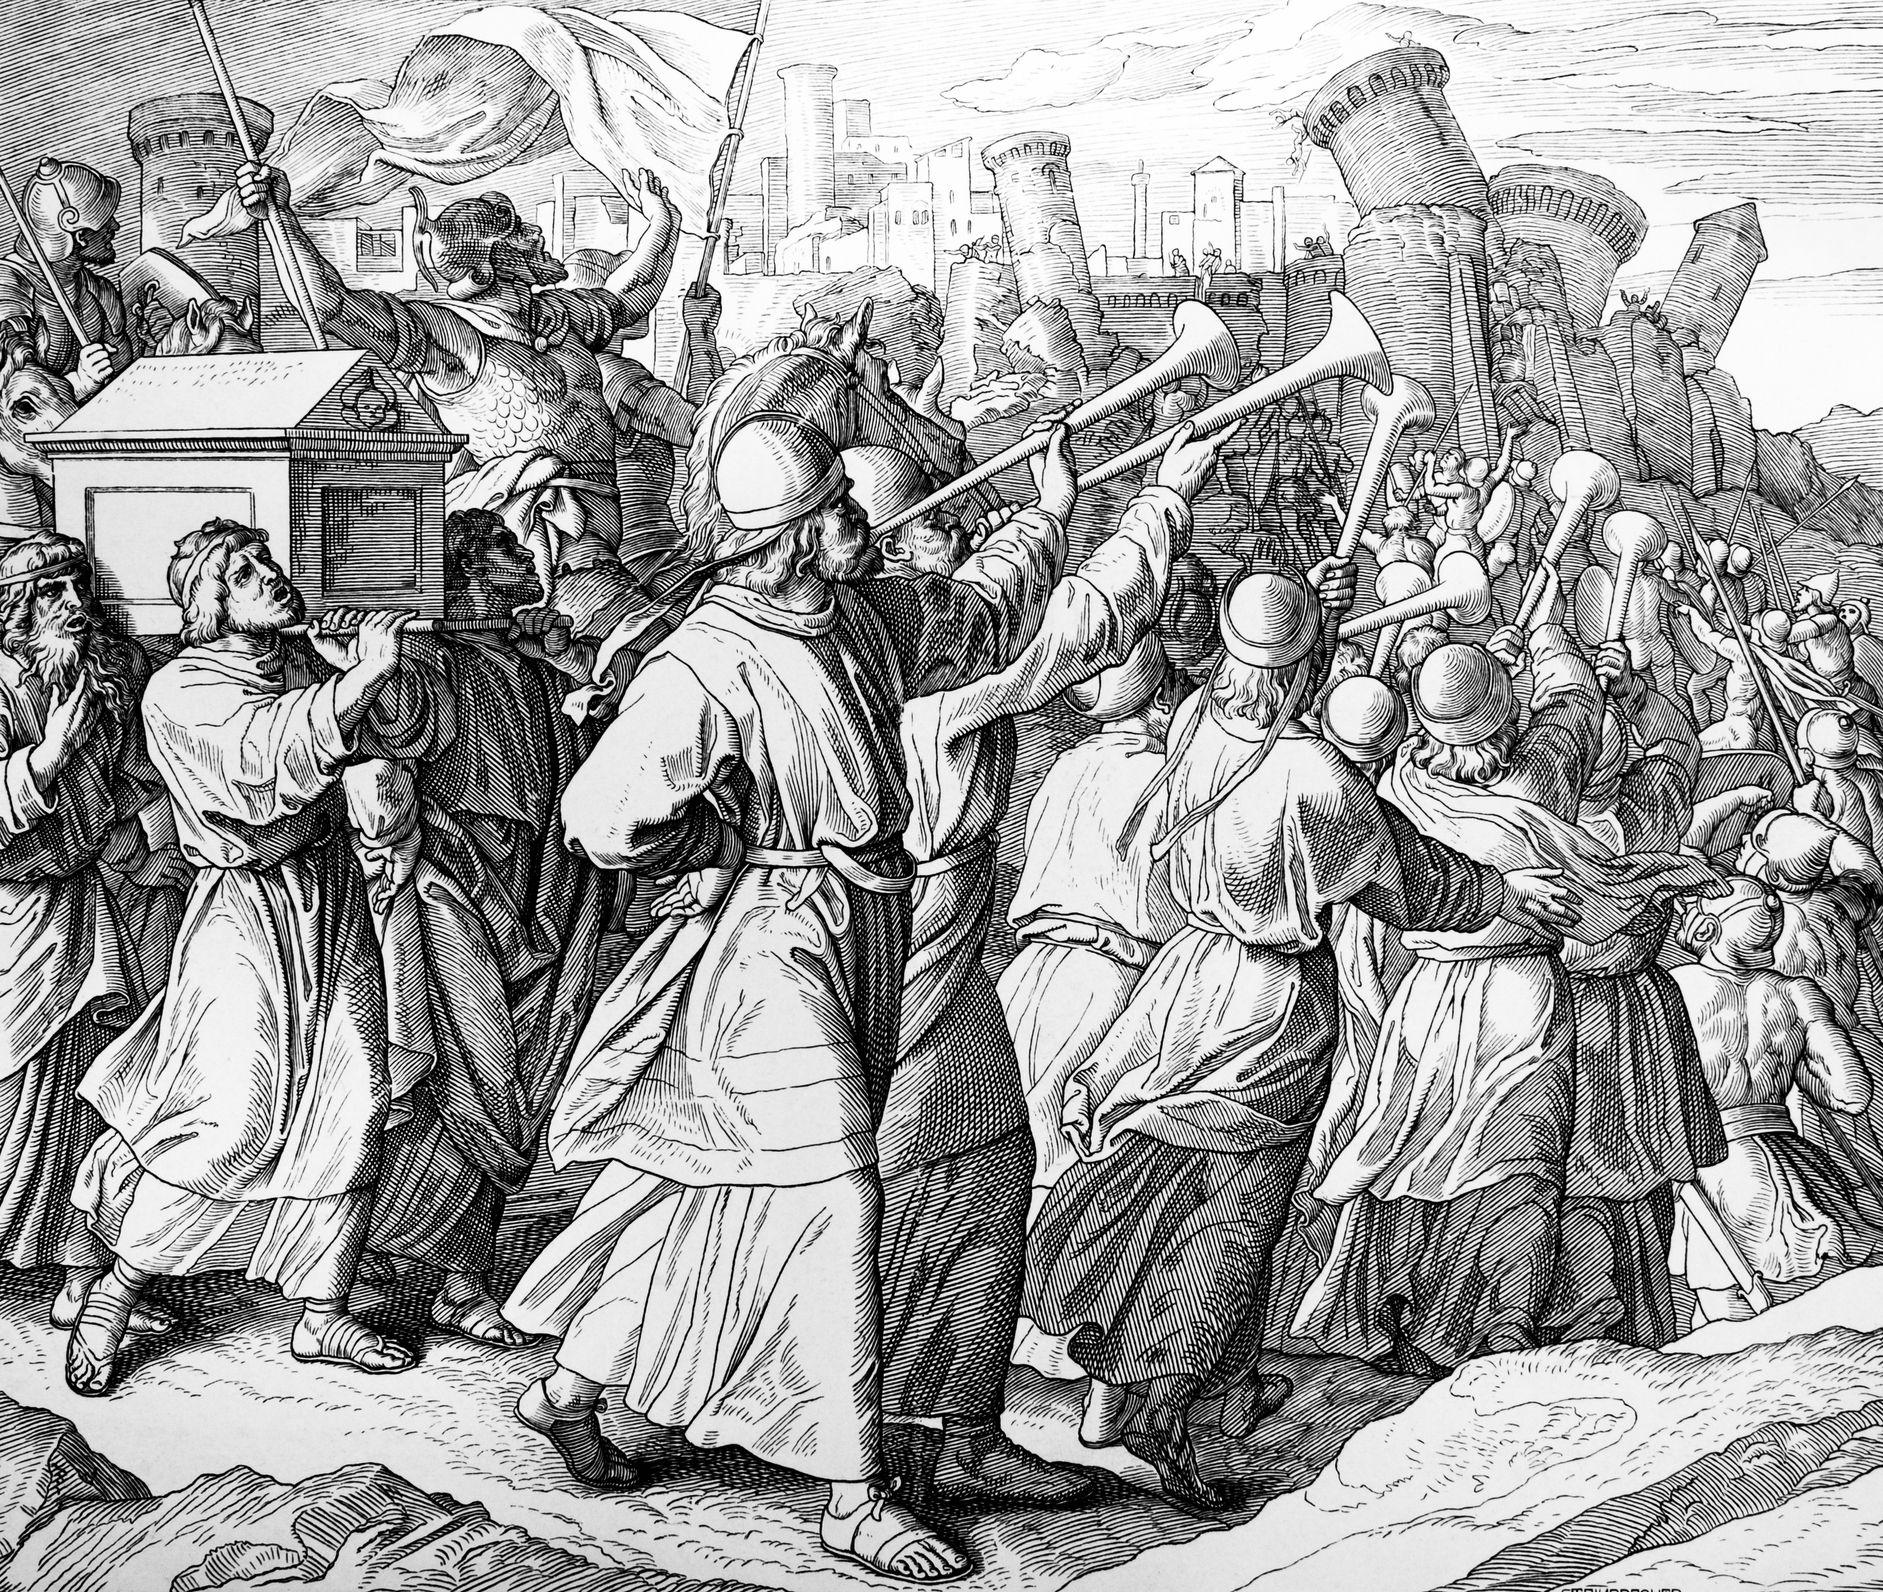 the battle of jericho ジェリコの戦い joshua fit the battle of jericho ジョシュアのジェリコ攻略を歌った黒人霊歌 合唱曲としても有名.